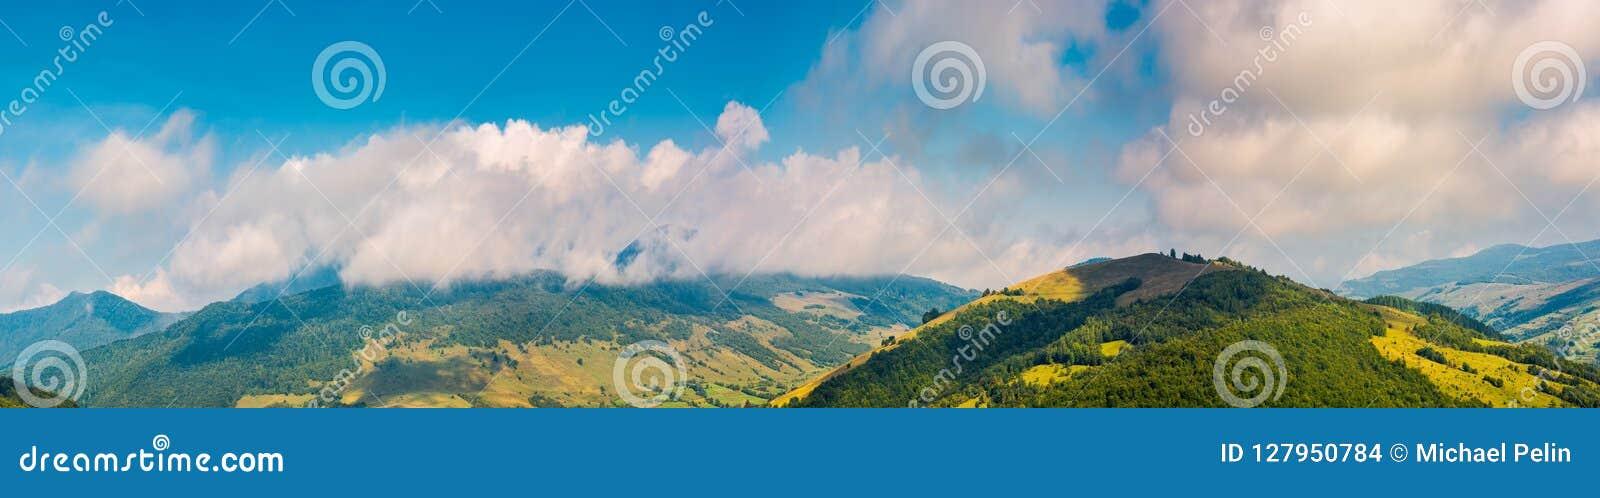 Panorama montanhoso maravilhoso no outono